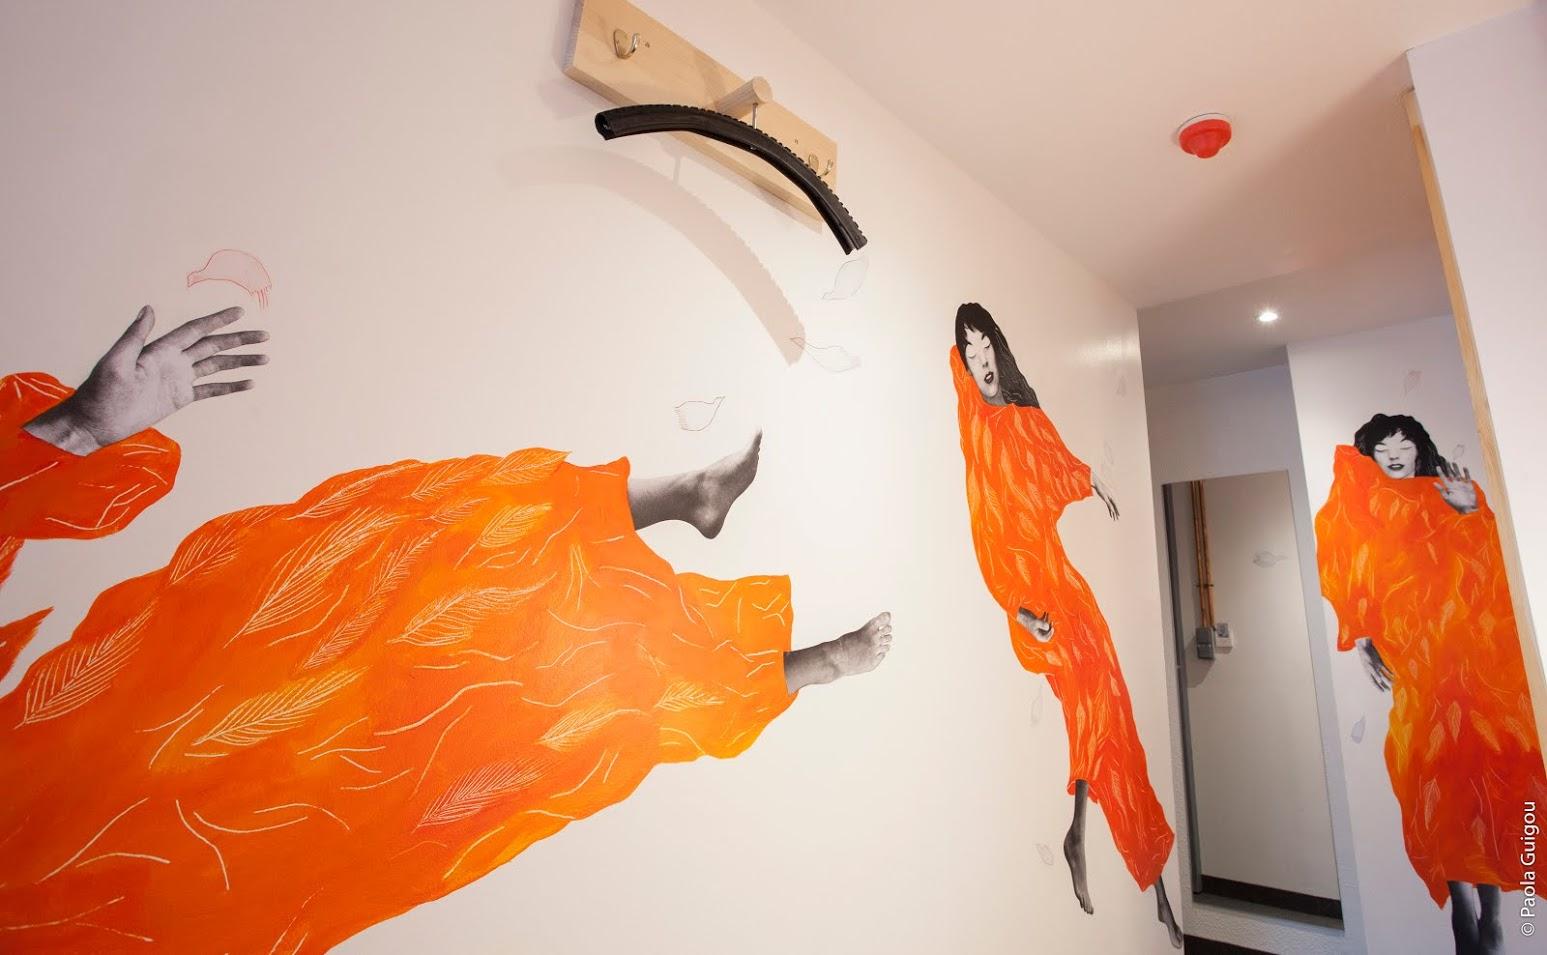 Room 405 by SHERLEY - (c) Paola Guigou - Graffalgar - 248